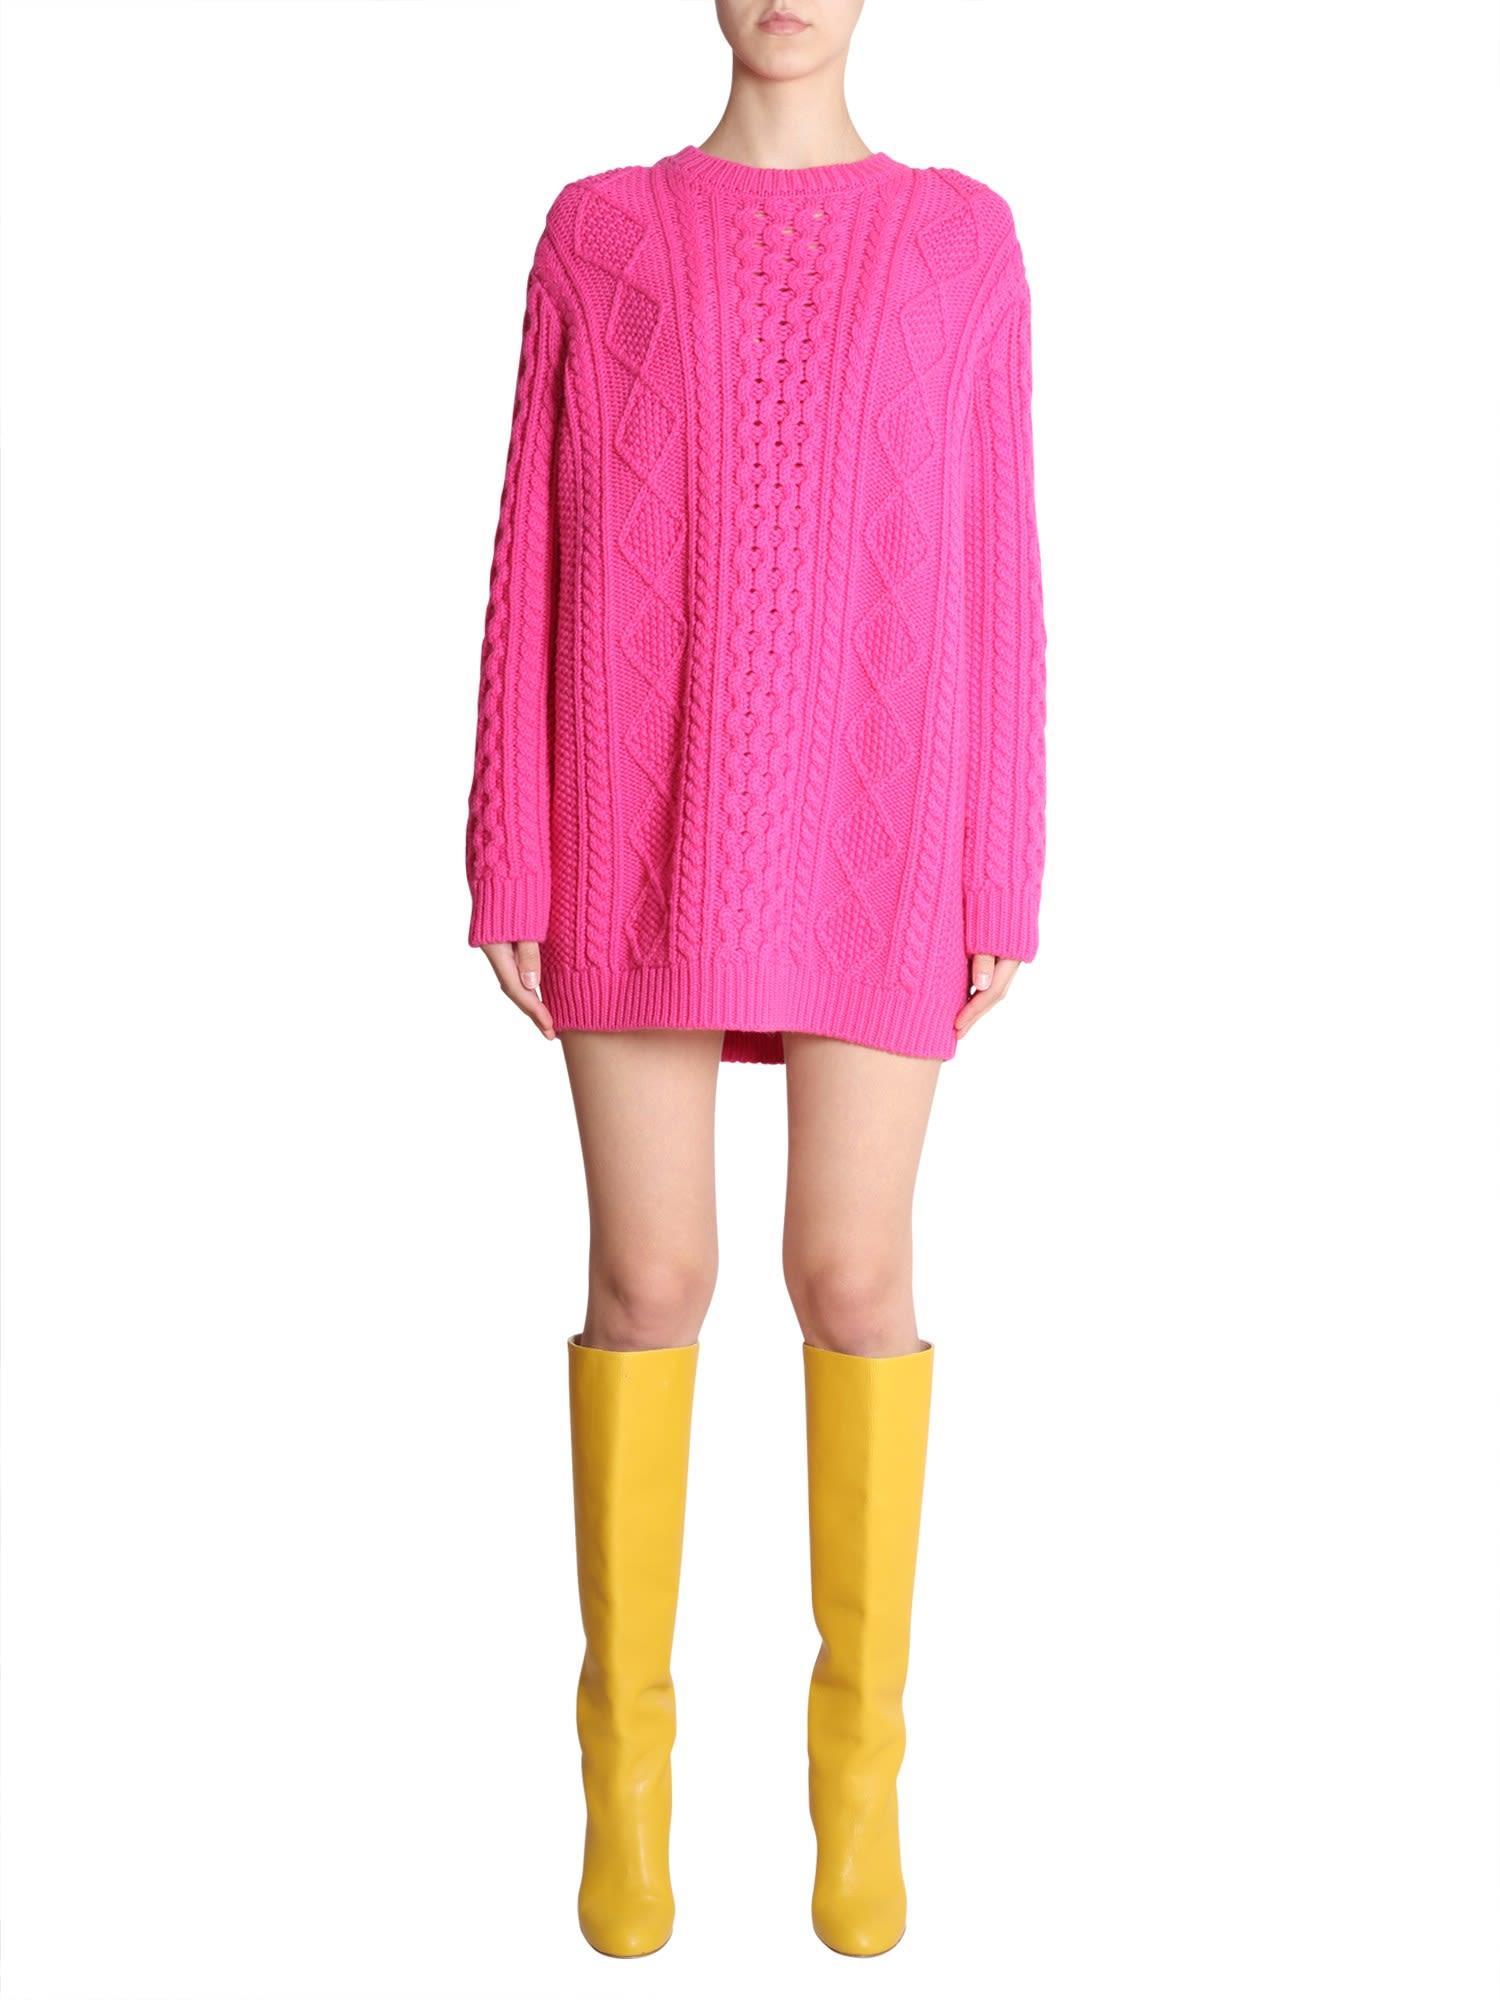 RED Valentino Mini Crochet Dress